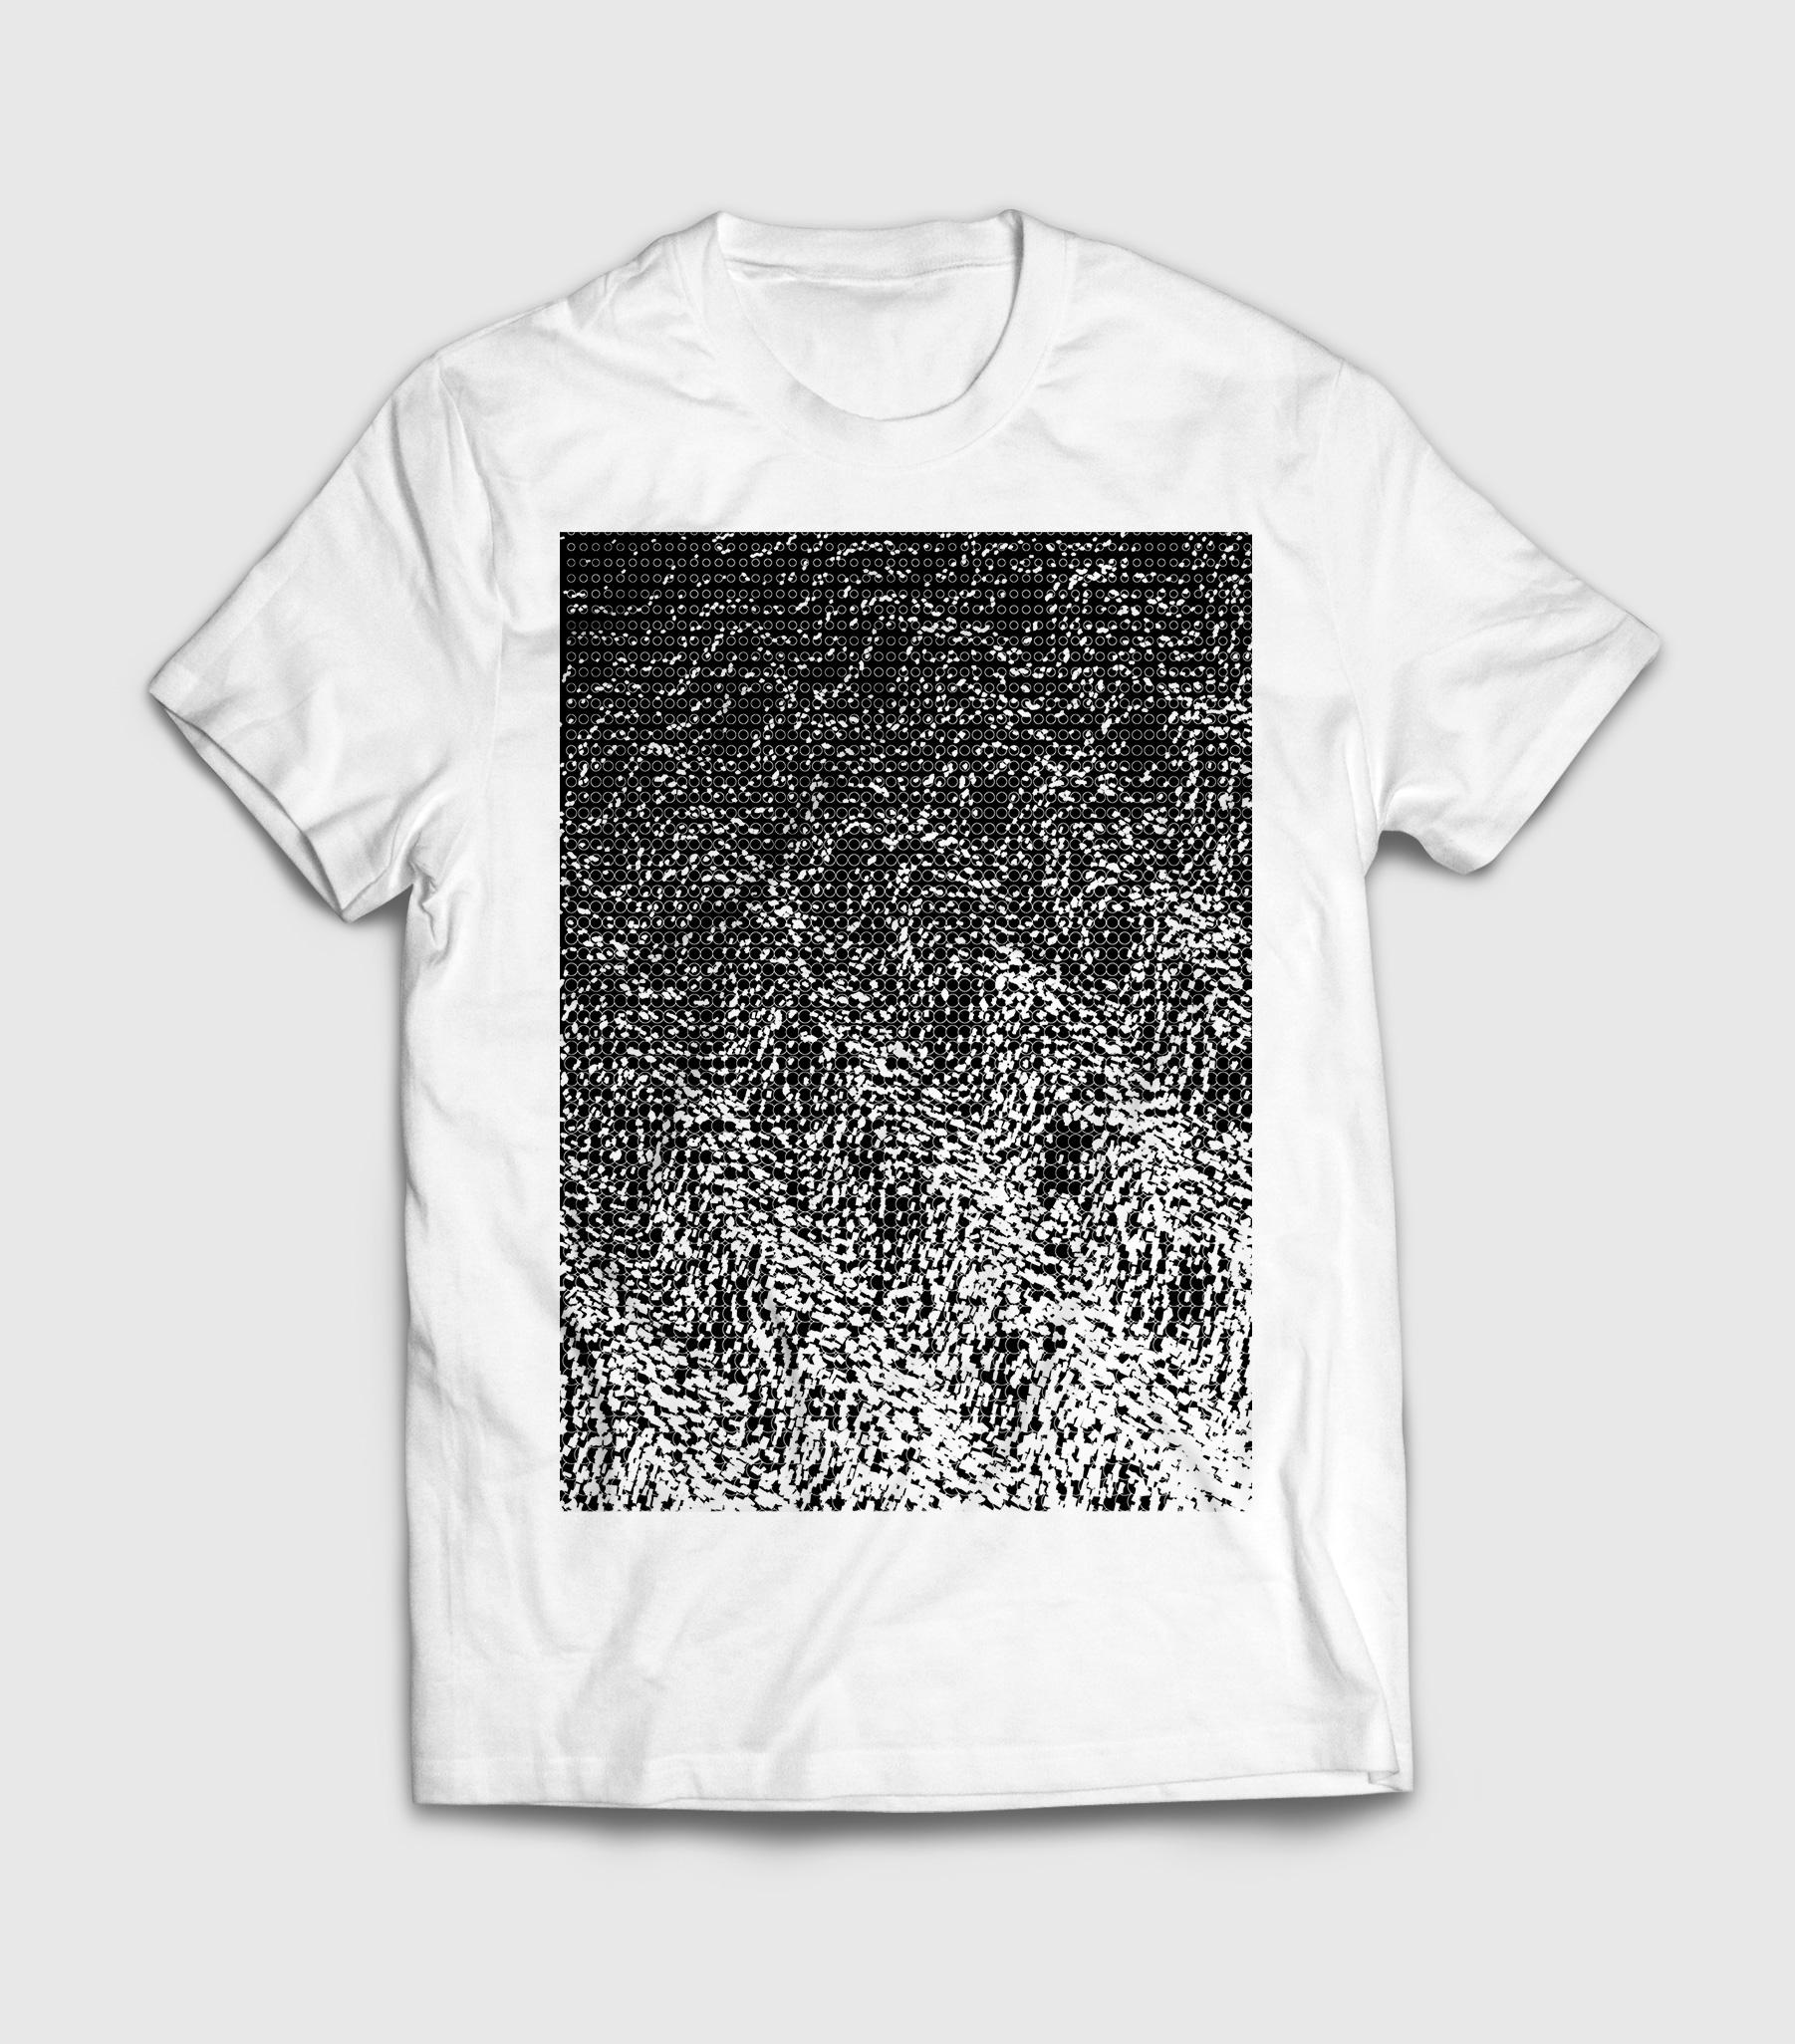 T-Shirt-MockUp_texture